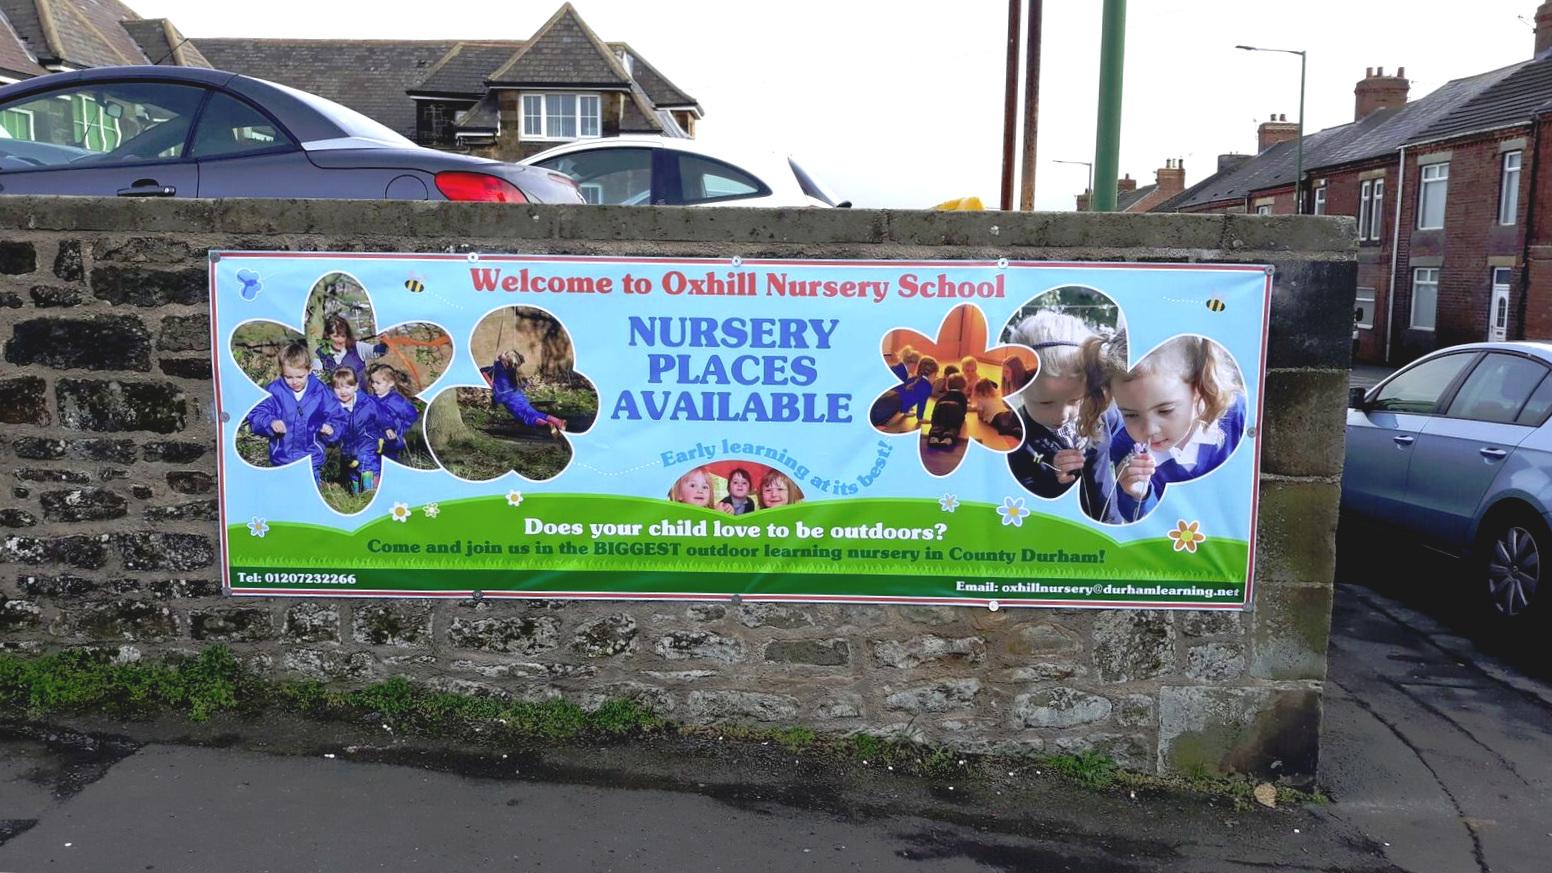 Oxhill Nursery